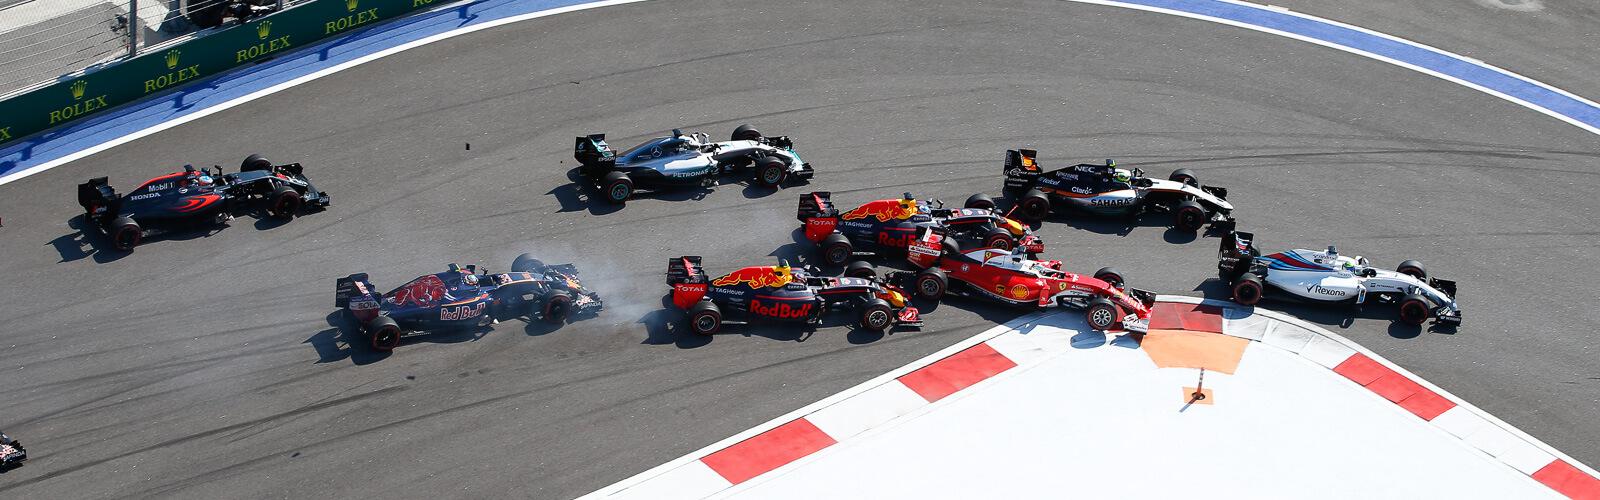 Edge Global Events | Formula 1 Paddock Club Official Distributor